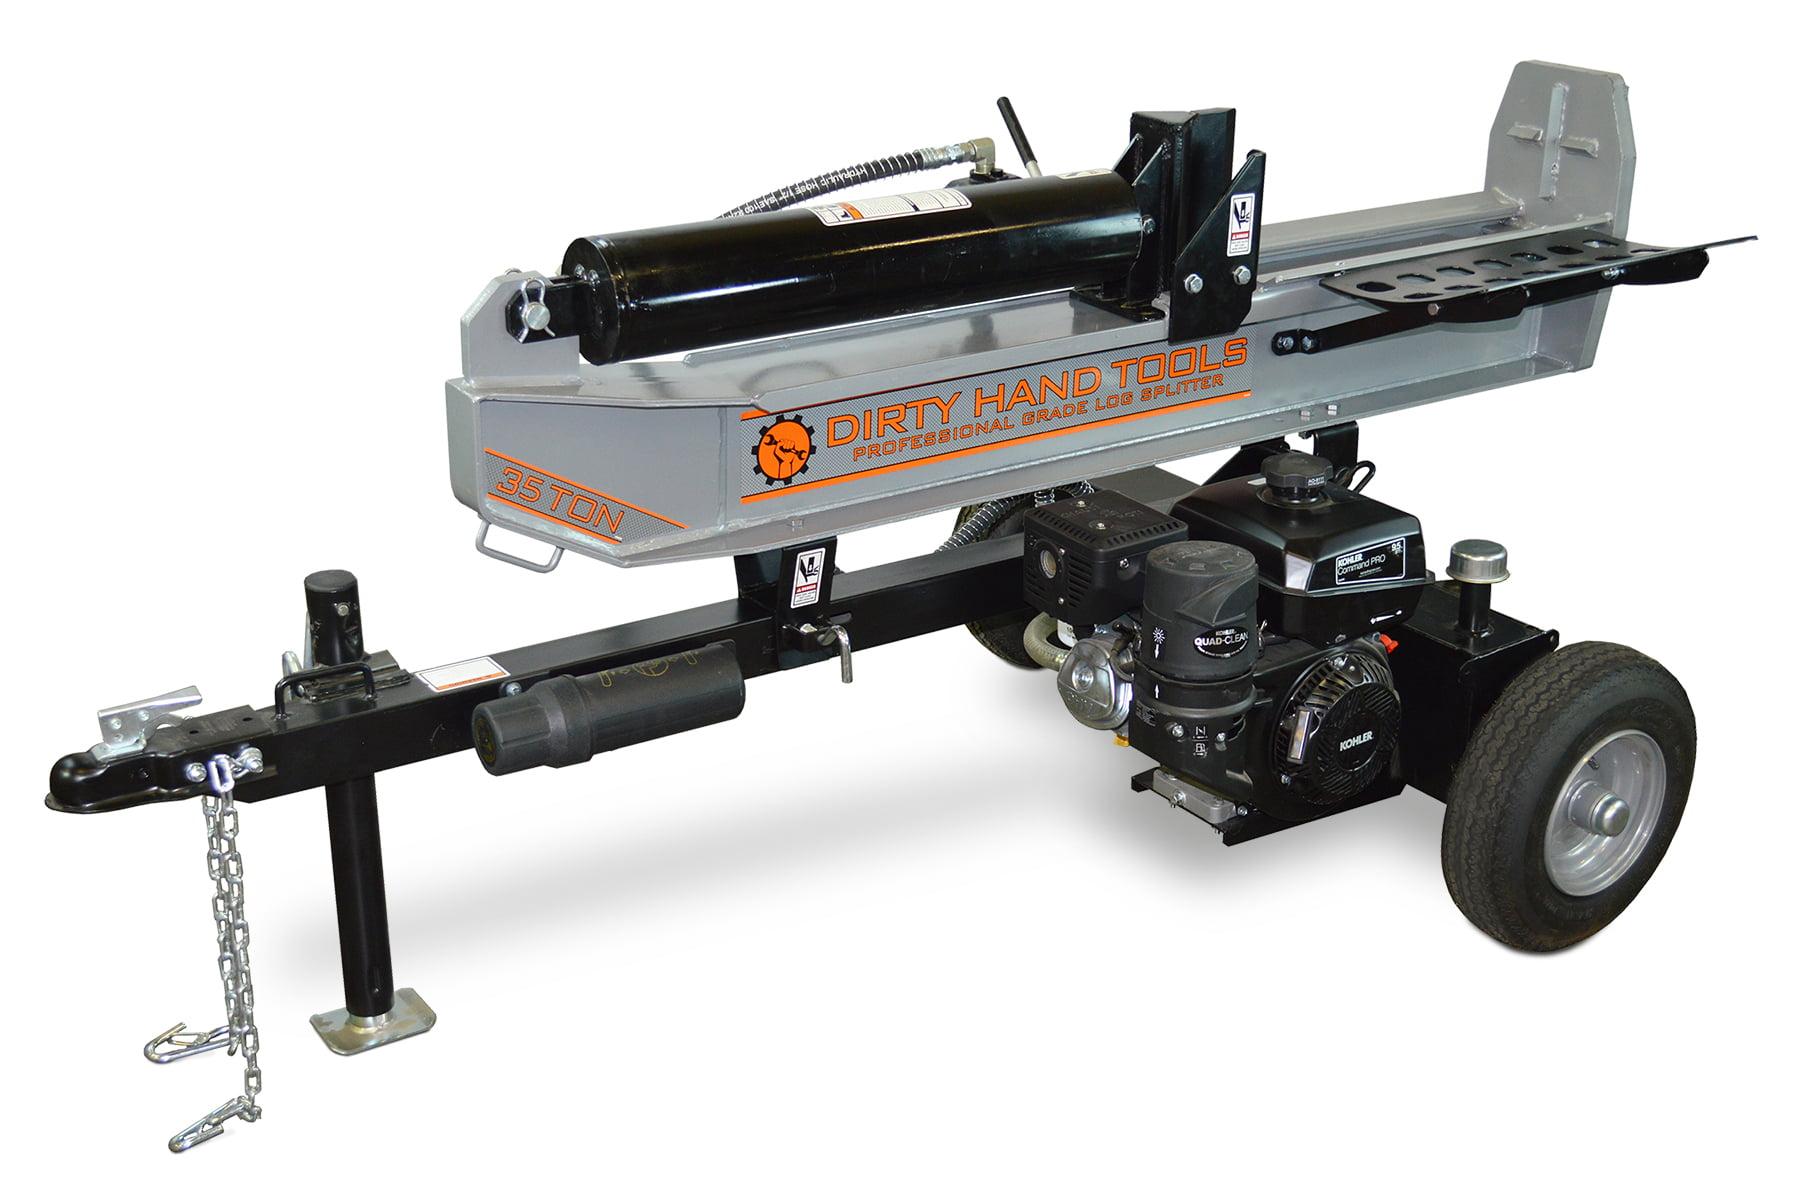 Dirty Hand Tools 35 Ton Horizontal Vertical Log Splitter, Kohler Engine by Dirty Hand Tools